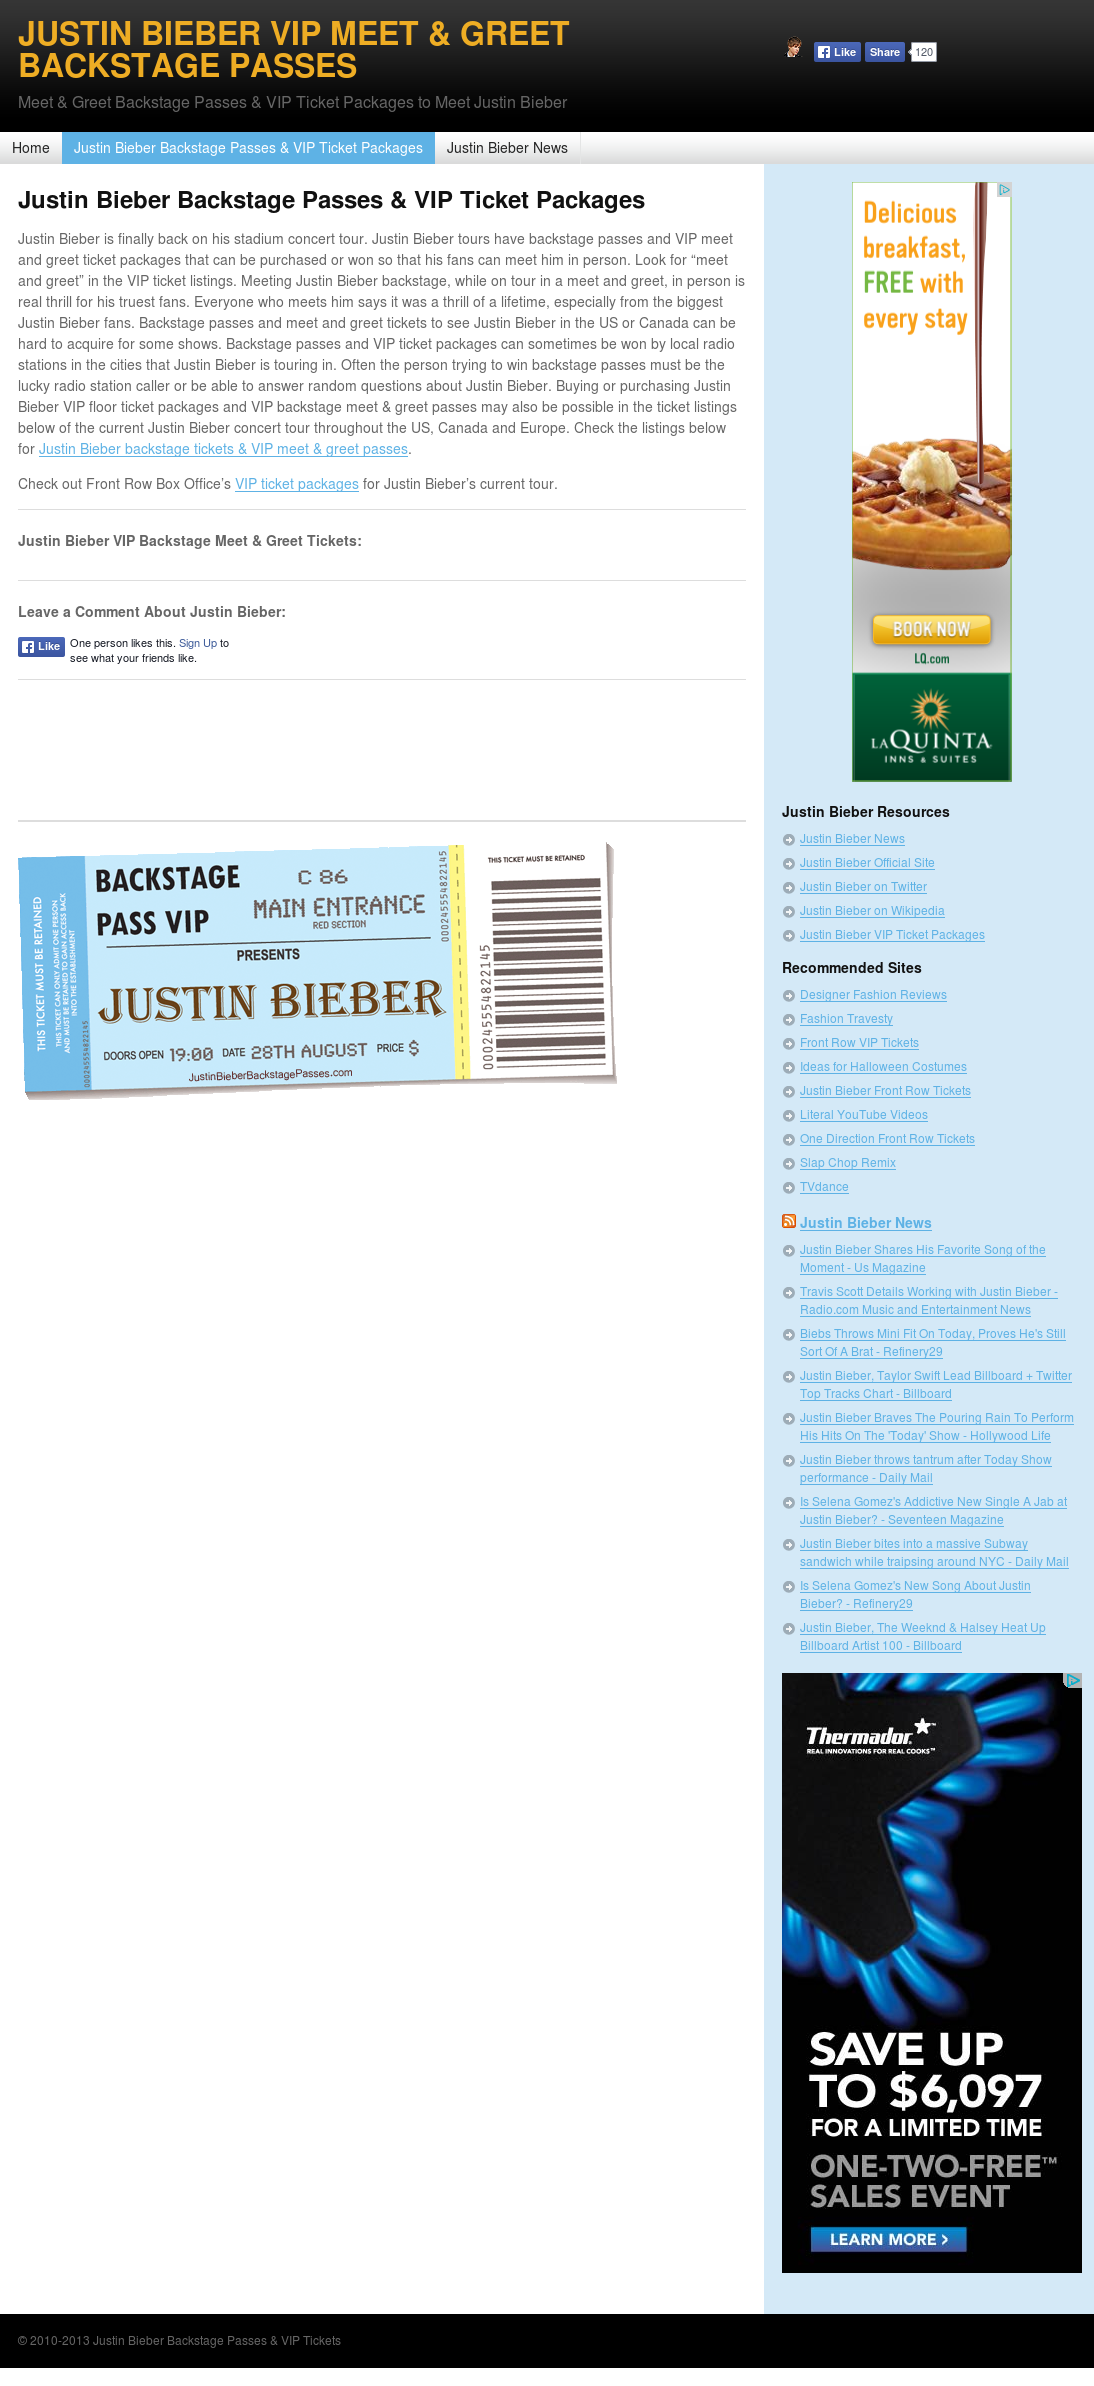 Justin Bieber Backstage Passes Vip Tickets Competitors Revenue